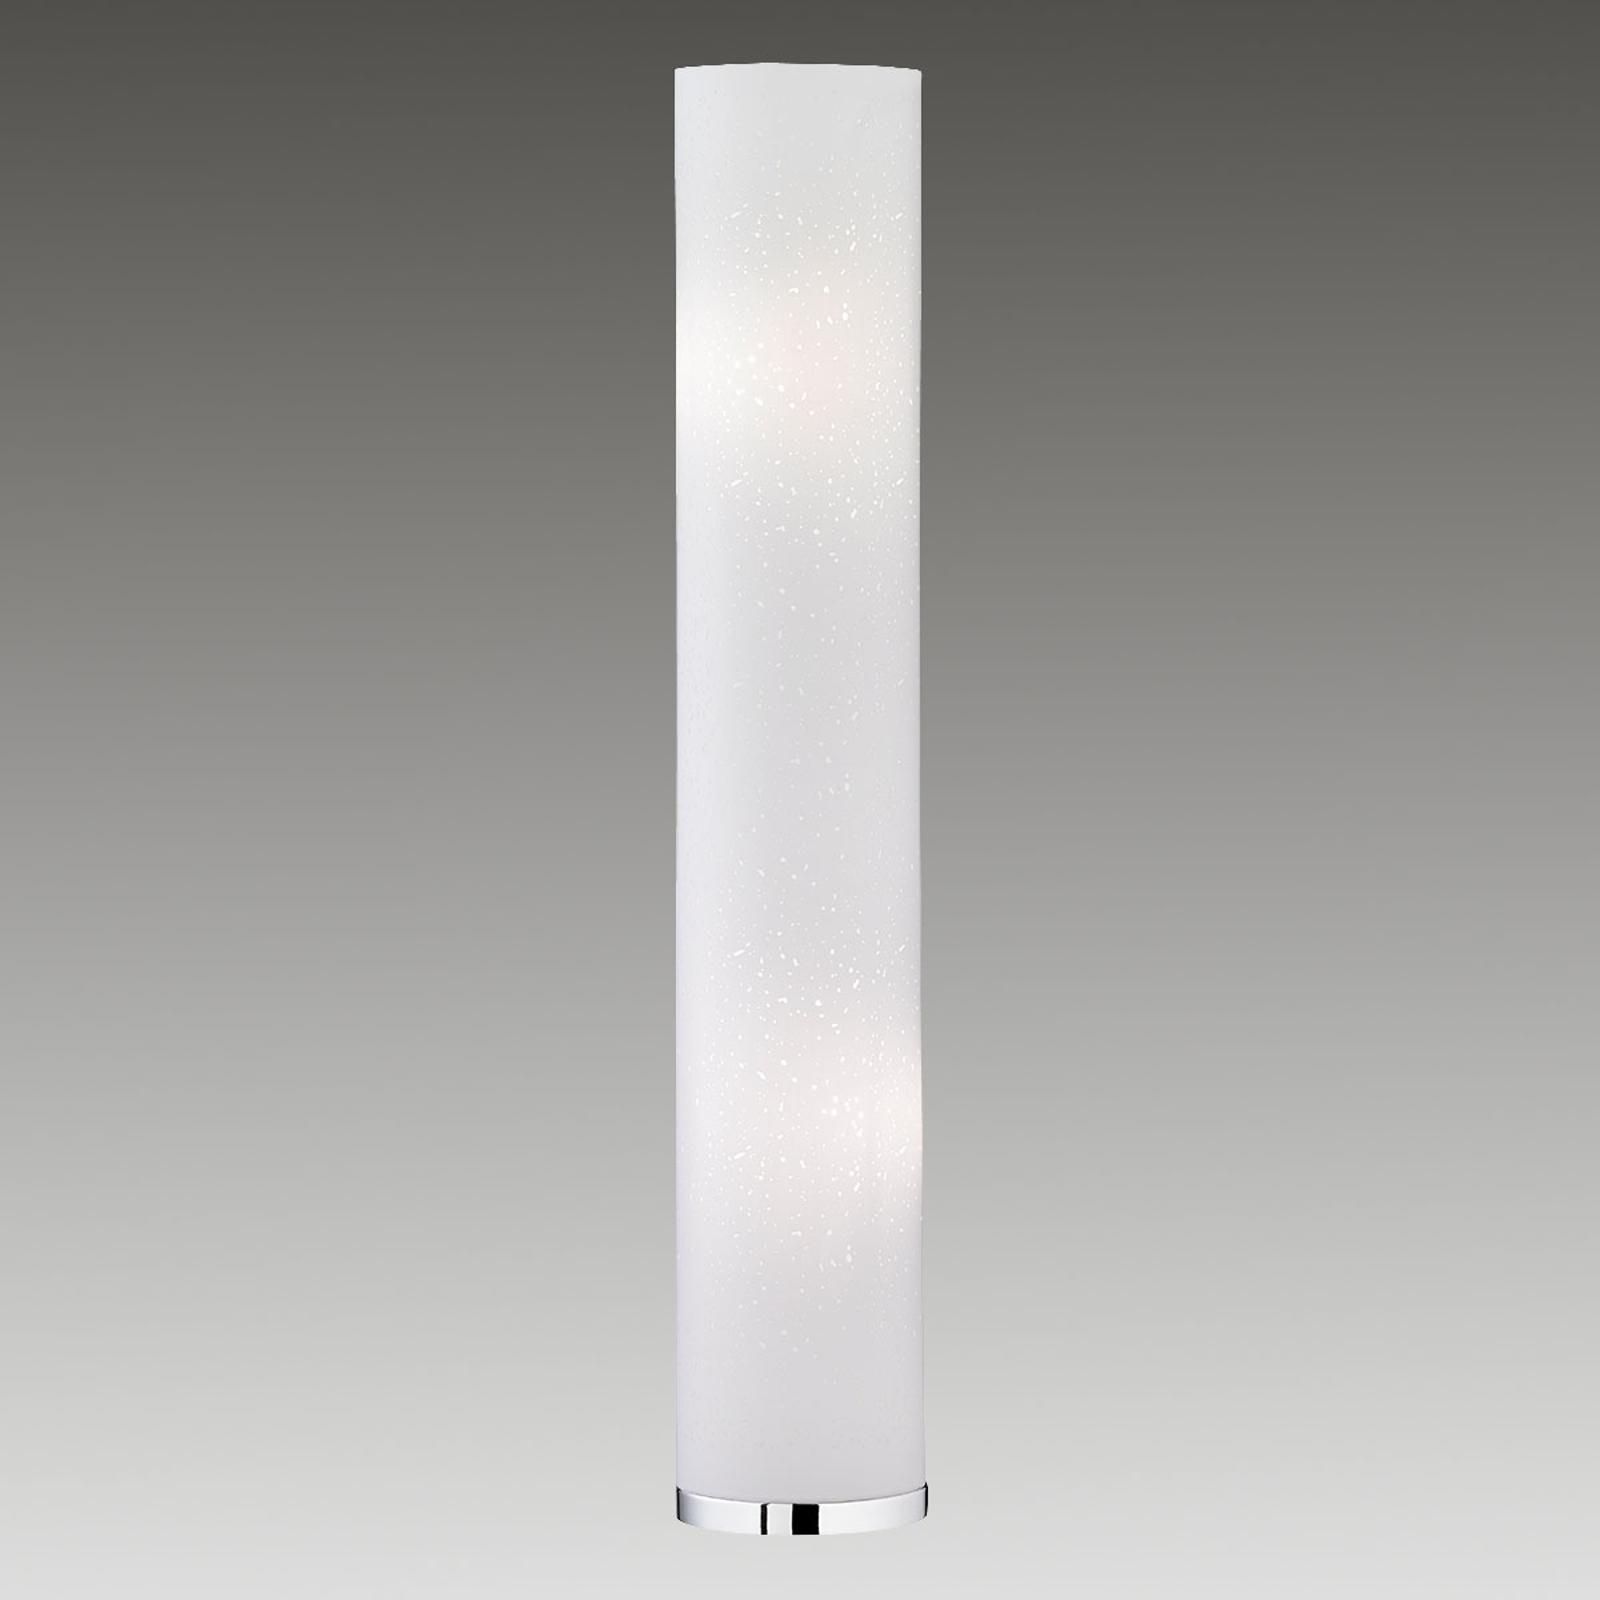 Gulvlampe Thor 110 cm i hvid